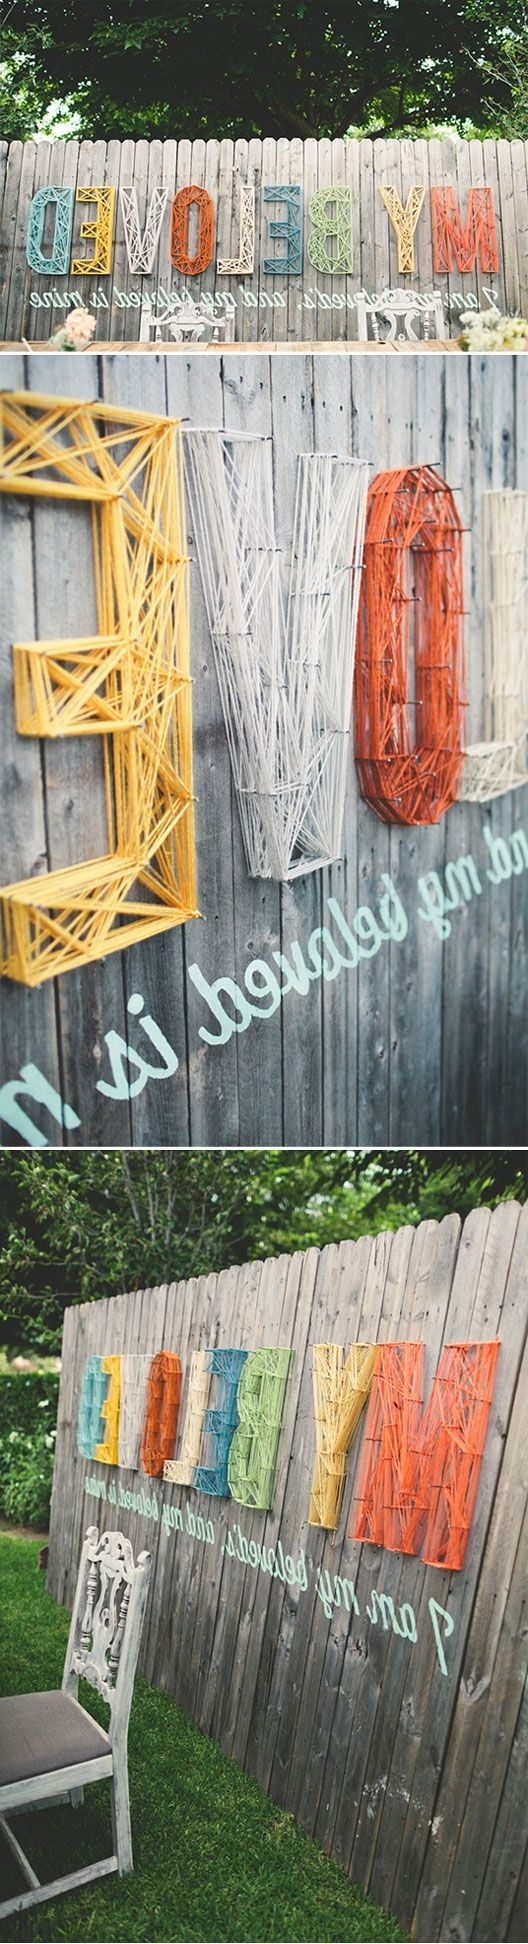 Widely Used Incredible Diy Garden Fence Wall Art Ideas Regarding Diy Garden Wall Art (View 15 of 15)